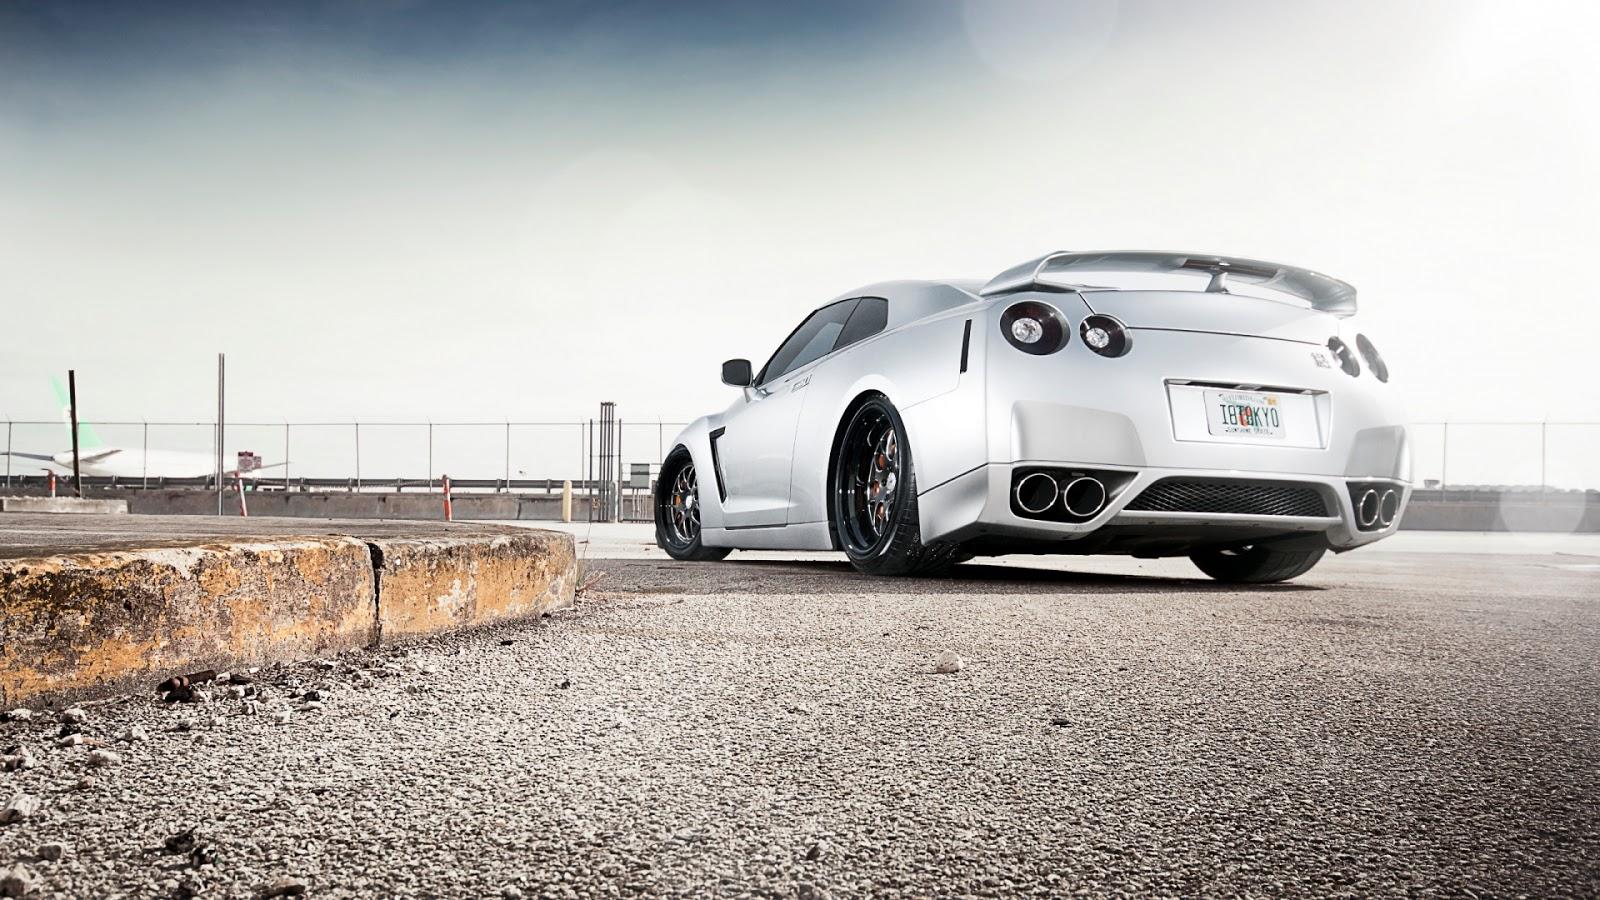 https://4.bp.blogspot.com/-b5MeA5Tl-QM/UPiBV-yeF4I/AAAAAAAAPOM/FRHucRK10Ek/s1600/Modified-Nissan-GTR35-1920x1080.jpg